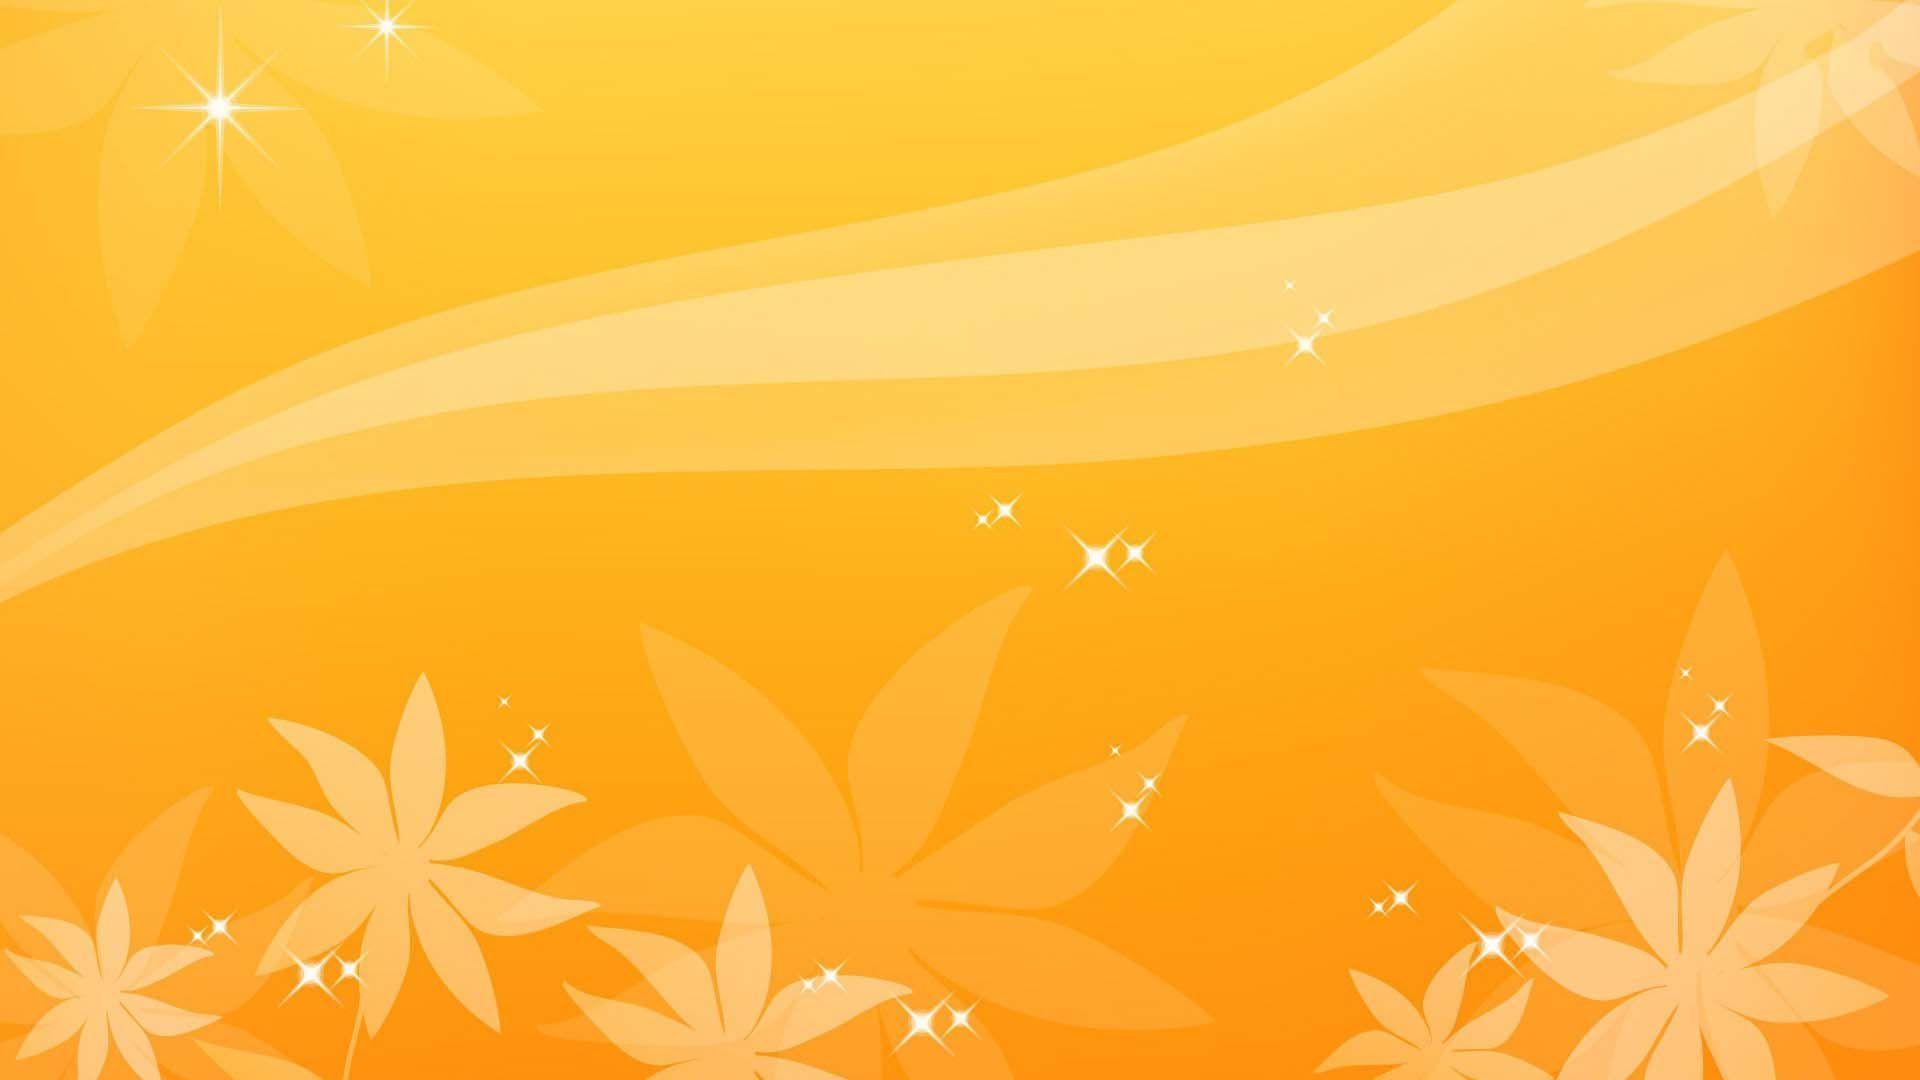 Orange 1080p Wallpaper